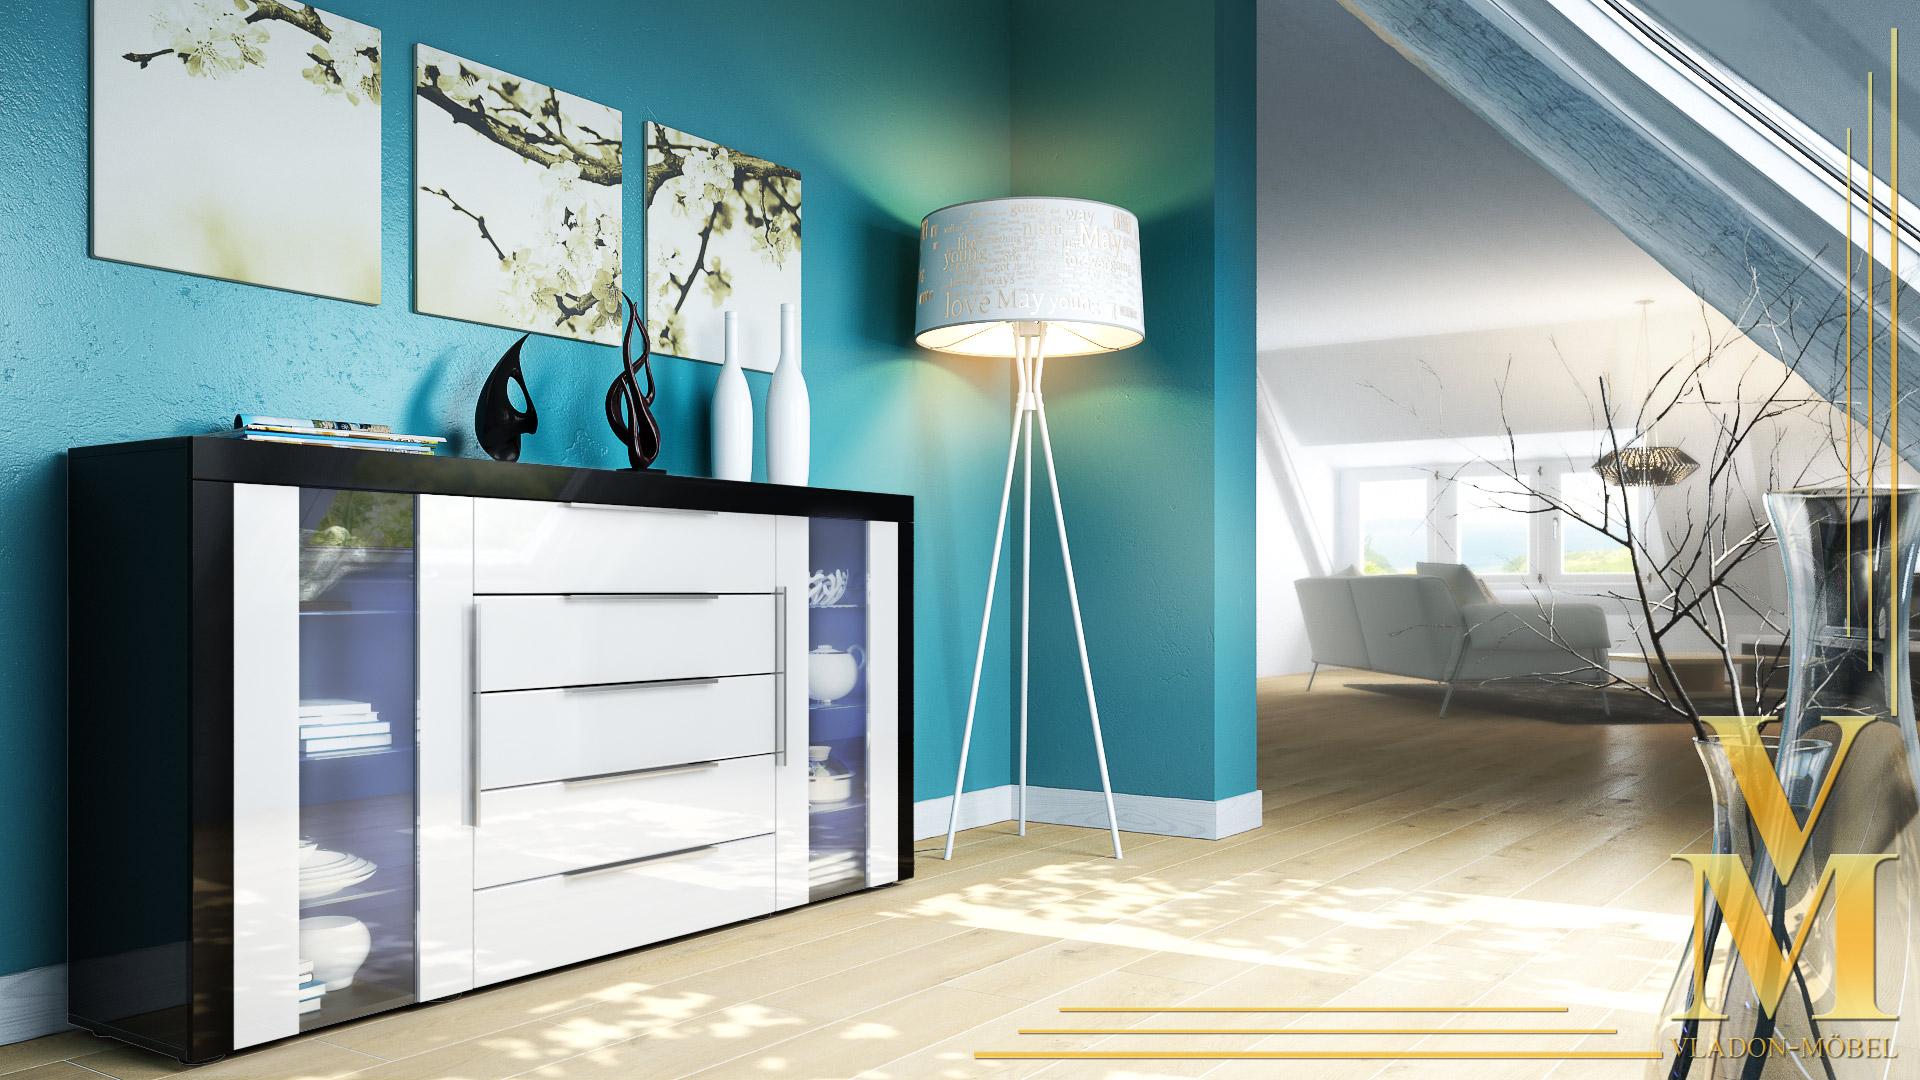 sideboard tv stand unit cabinet chest of drawers la paz. Black Bedroom Furniture Sets. Home Design Ideas